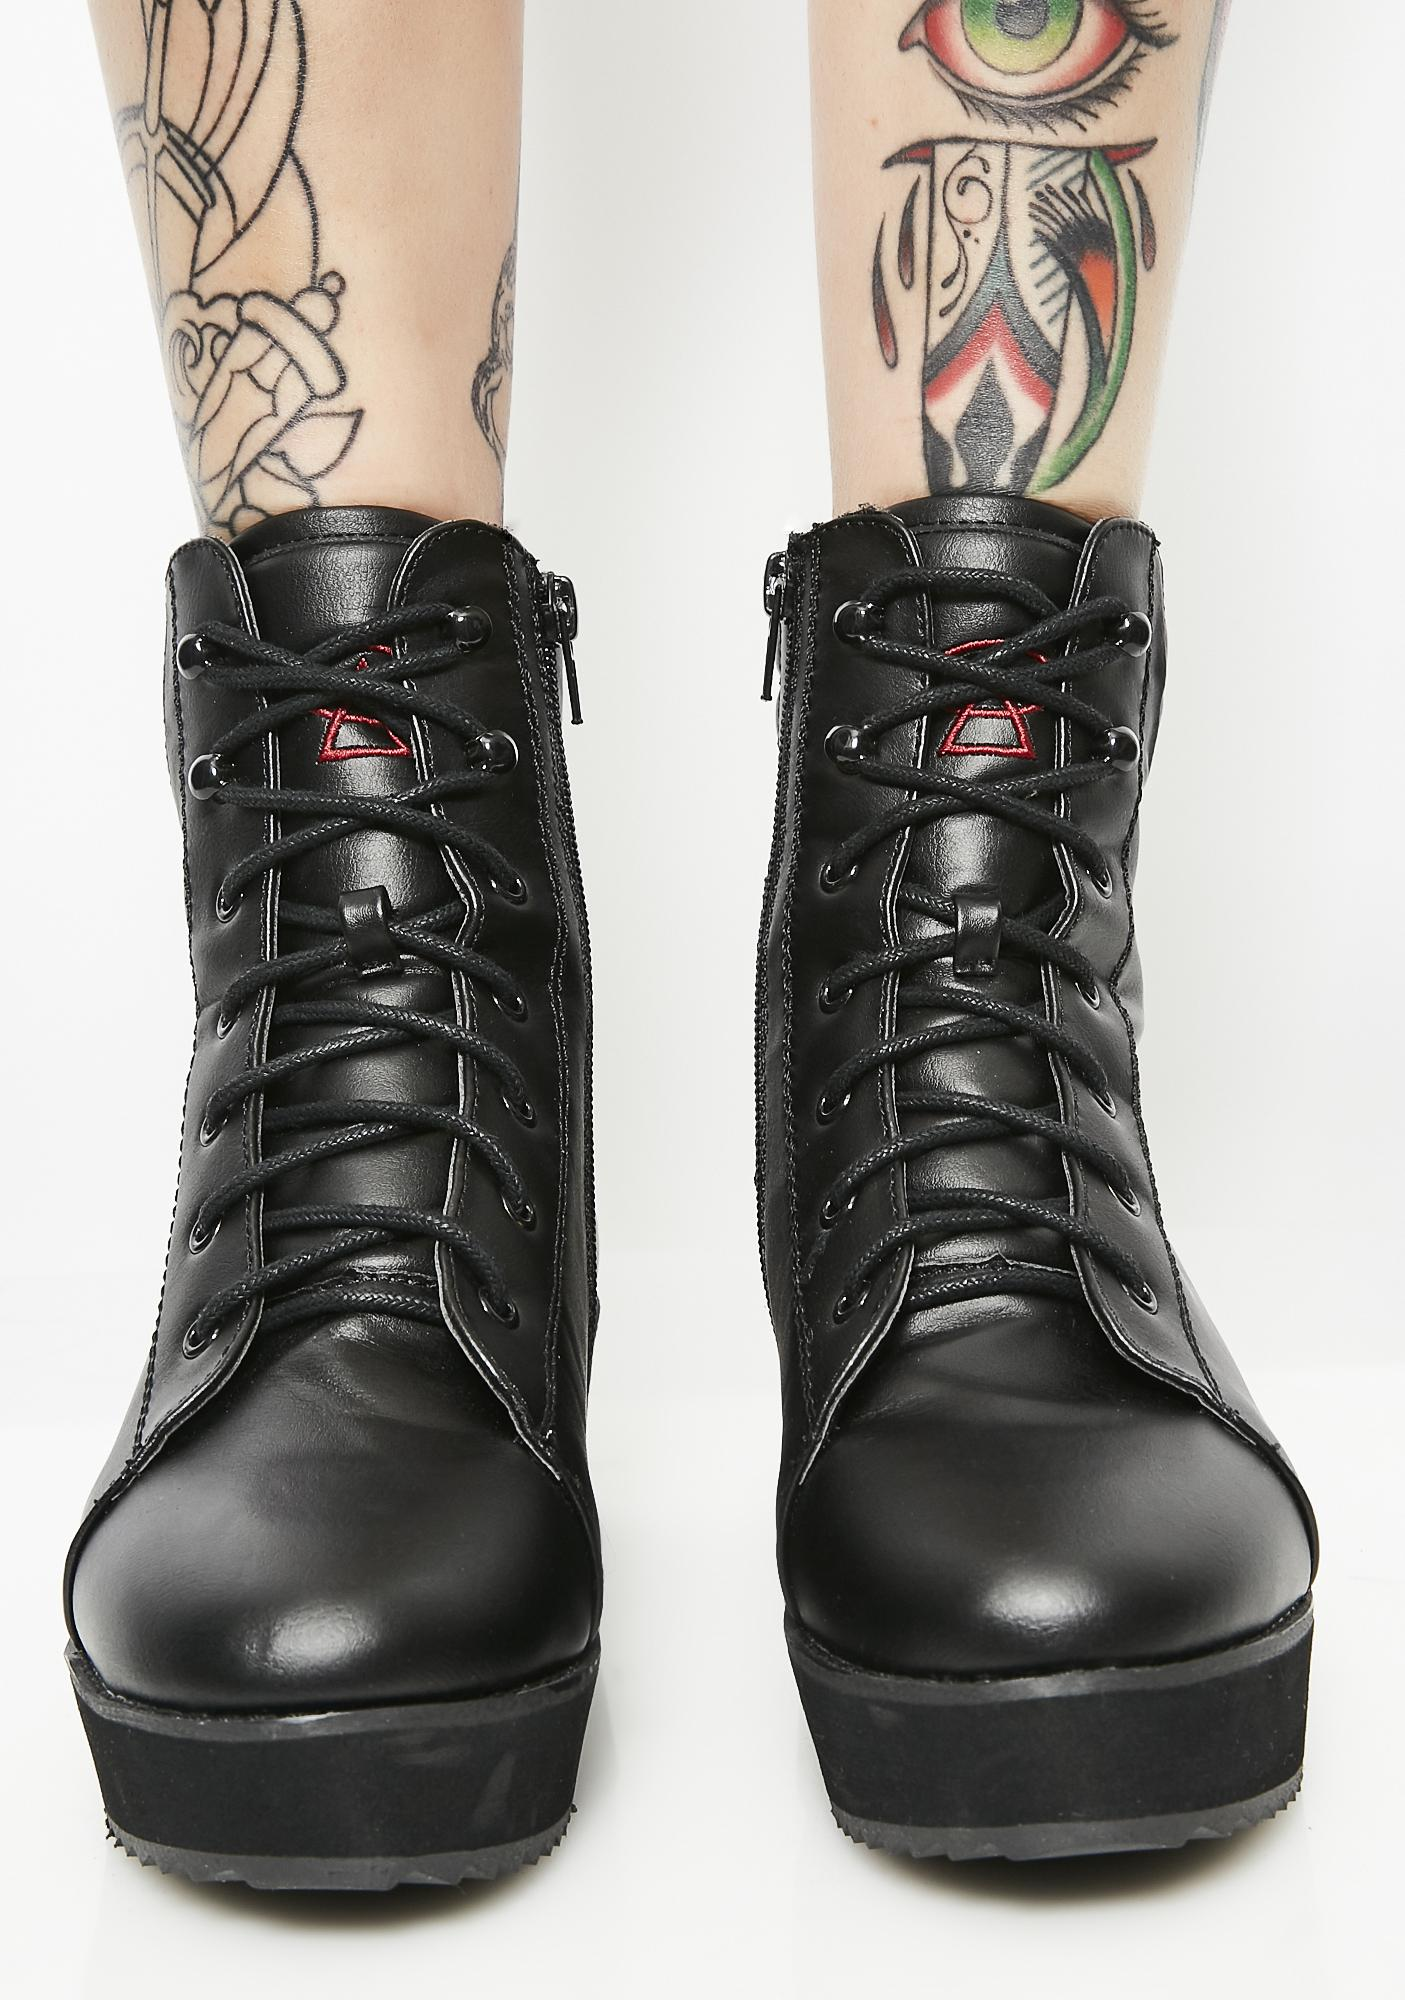 Strange Cvlt Darby Boots